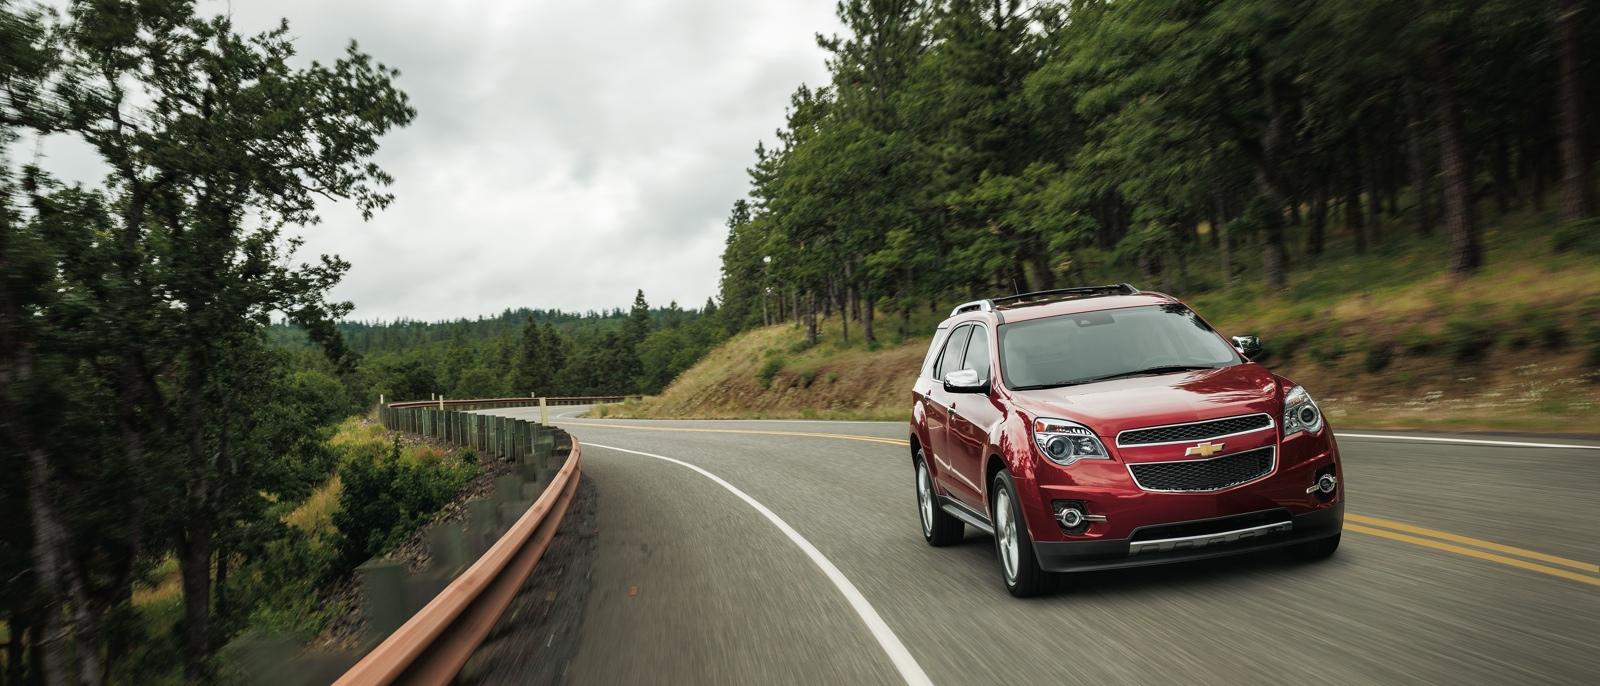 2015 Chevrolet Equinox on roadway